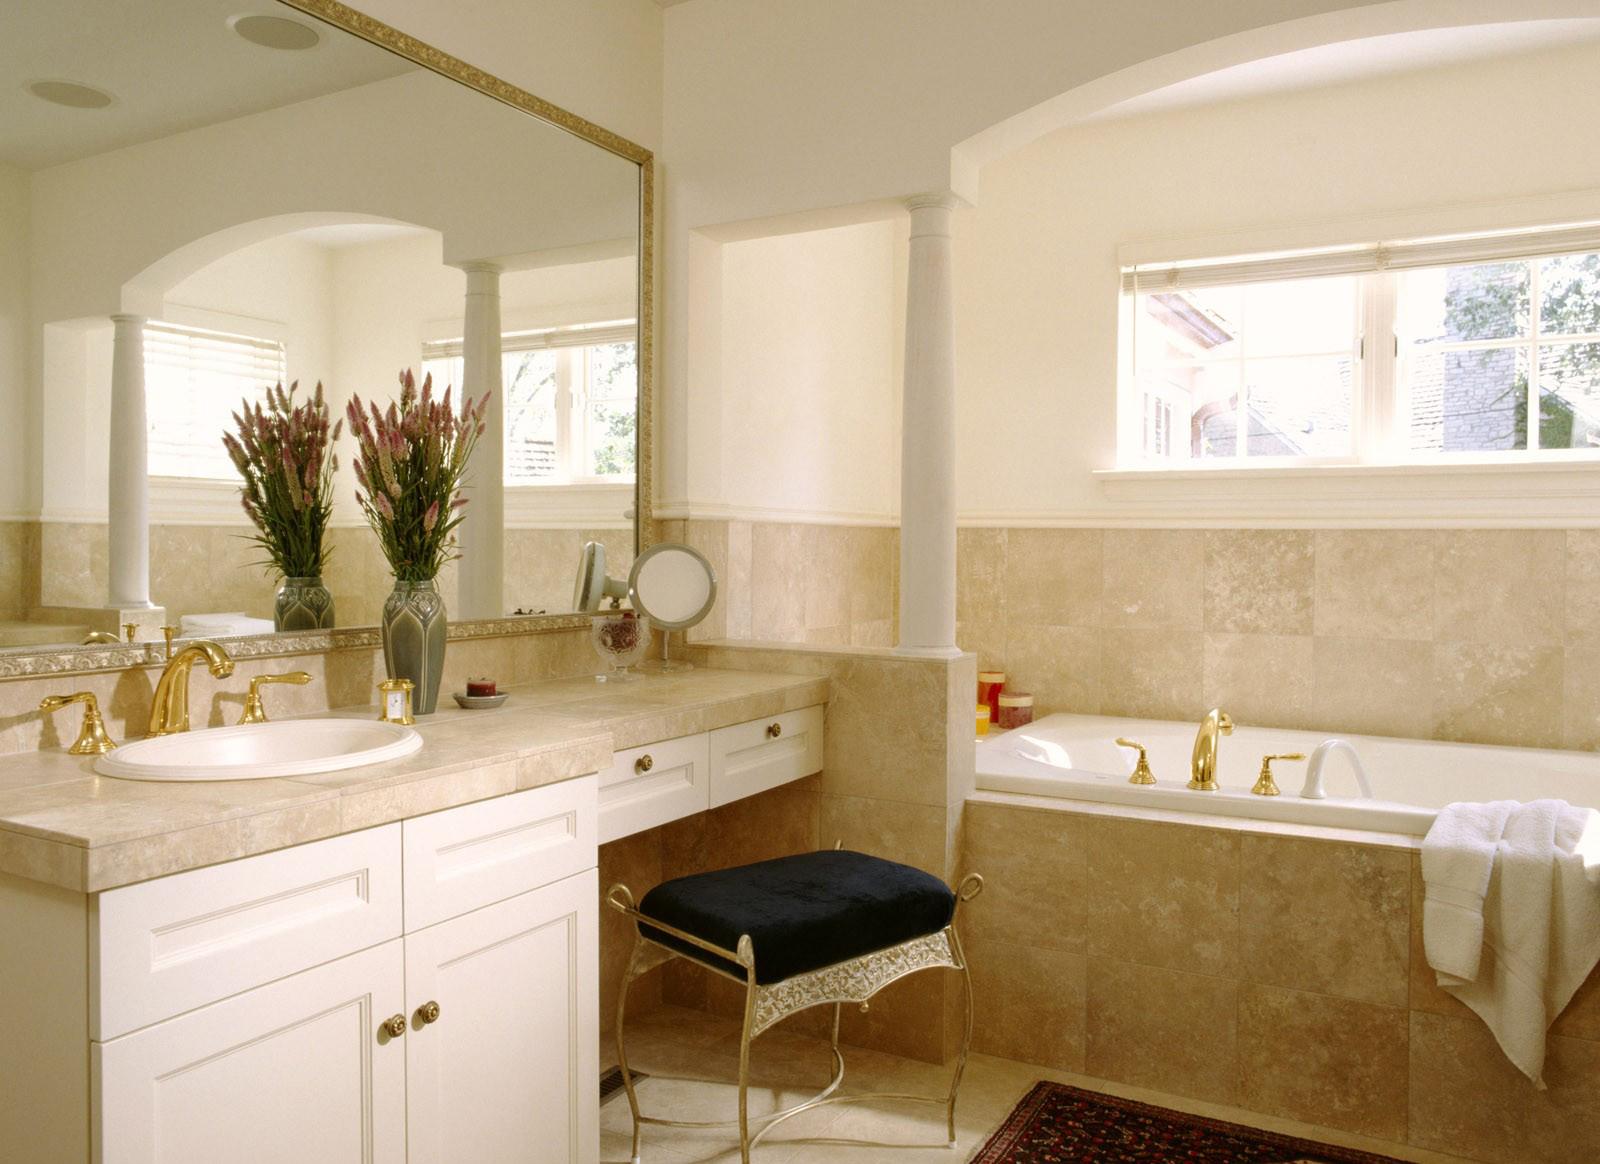 Бело-бежевая ванная комната без унитаза